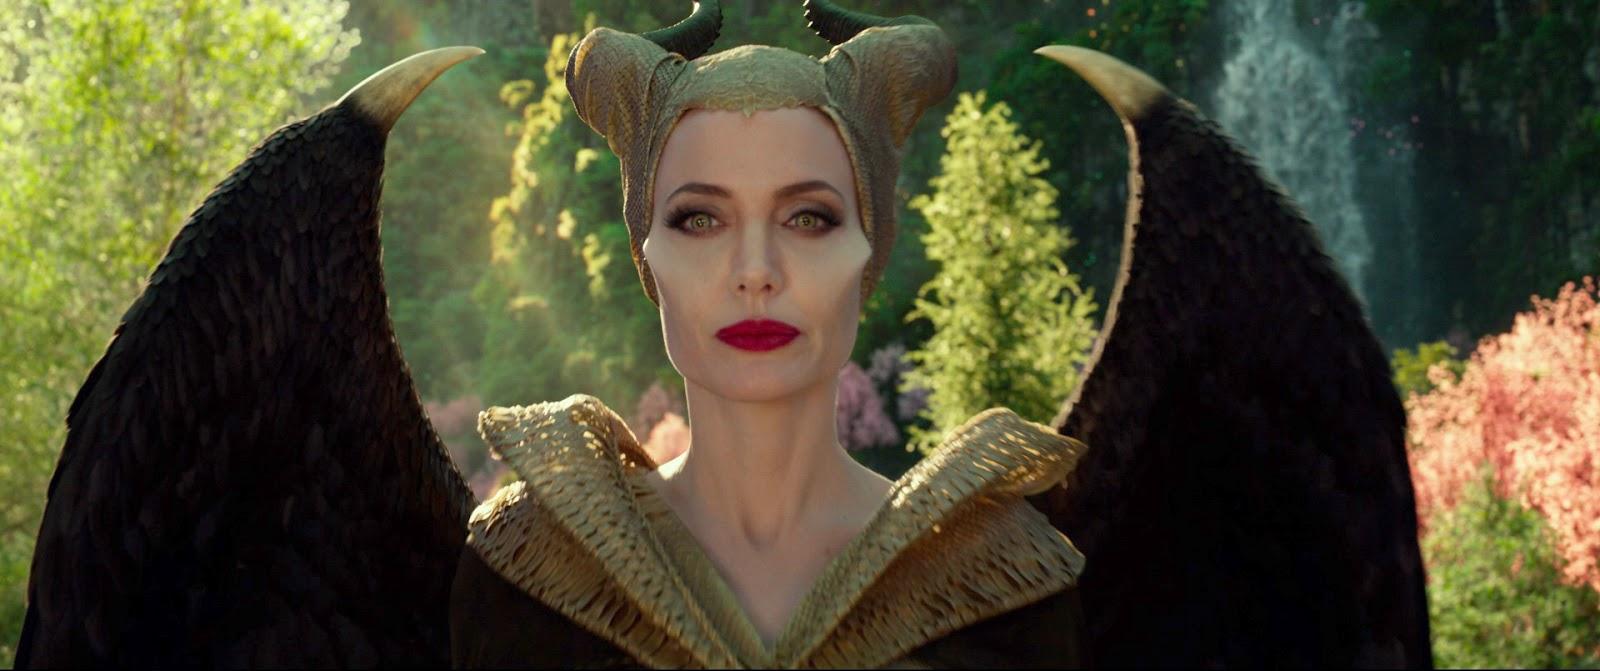 Maleficent Tiên Hắc Ám